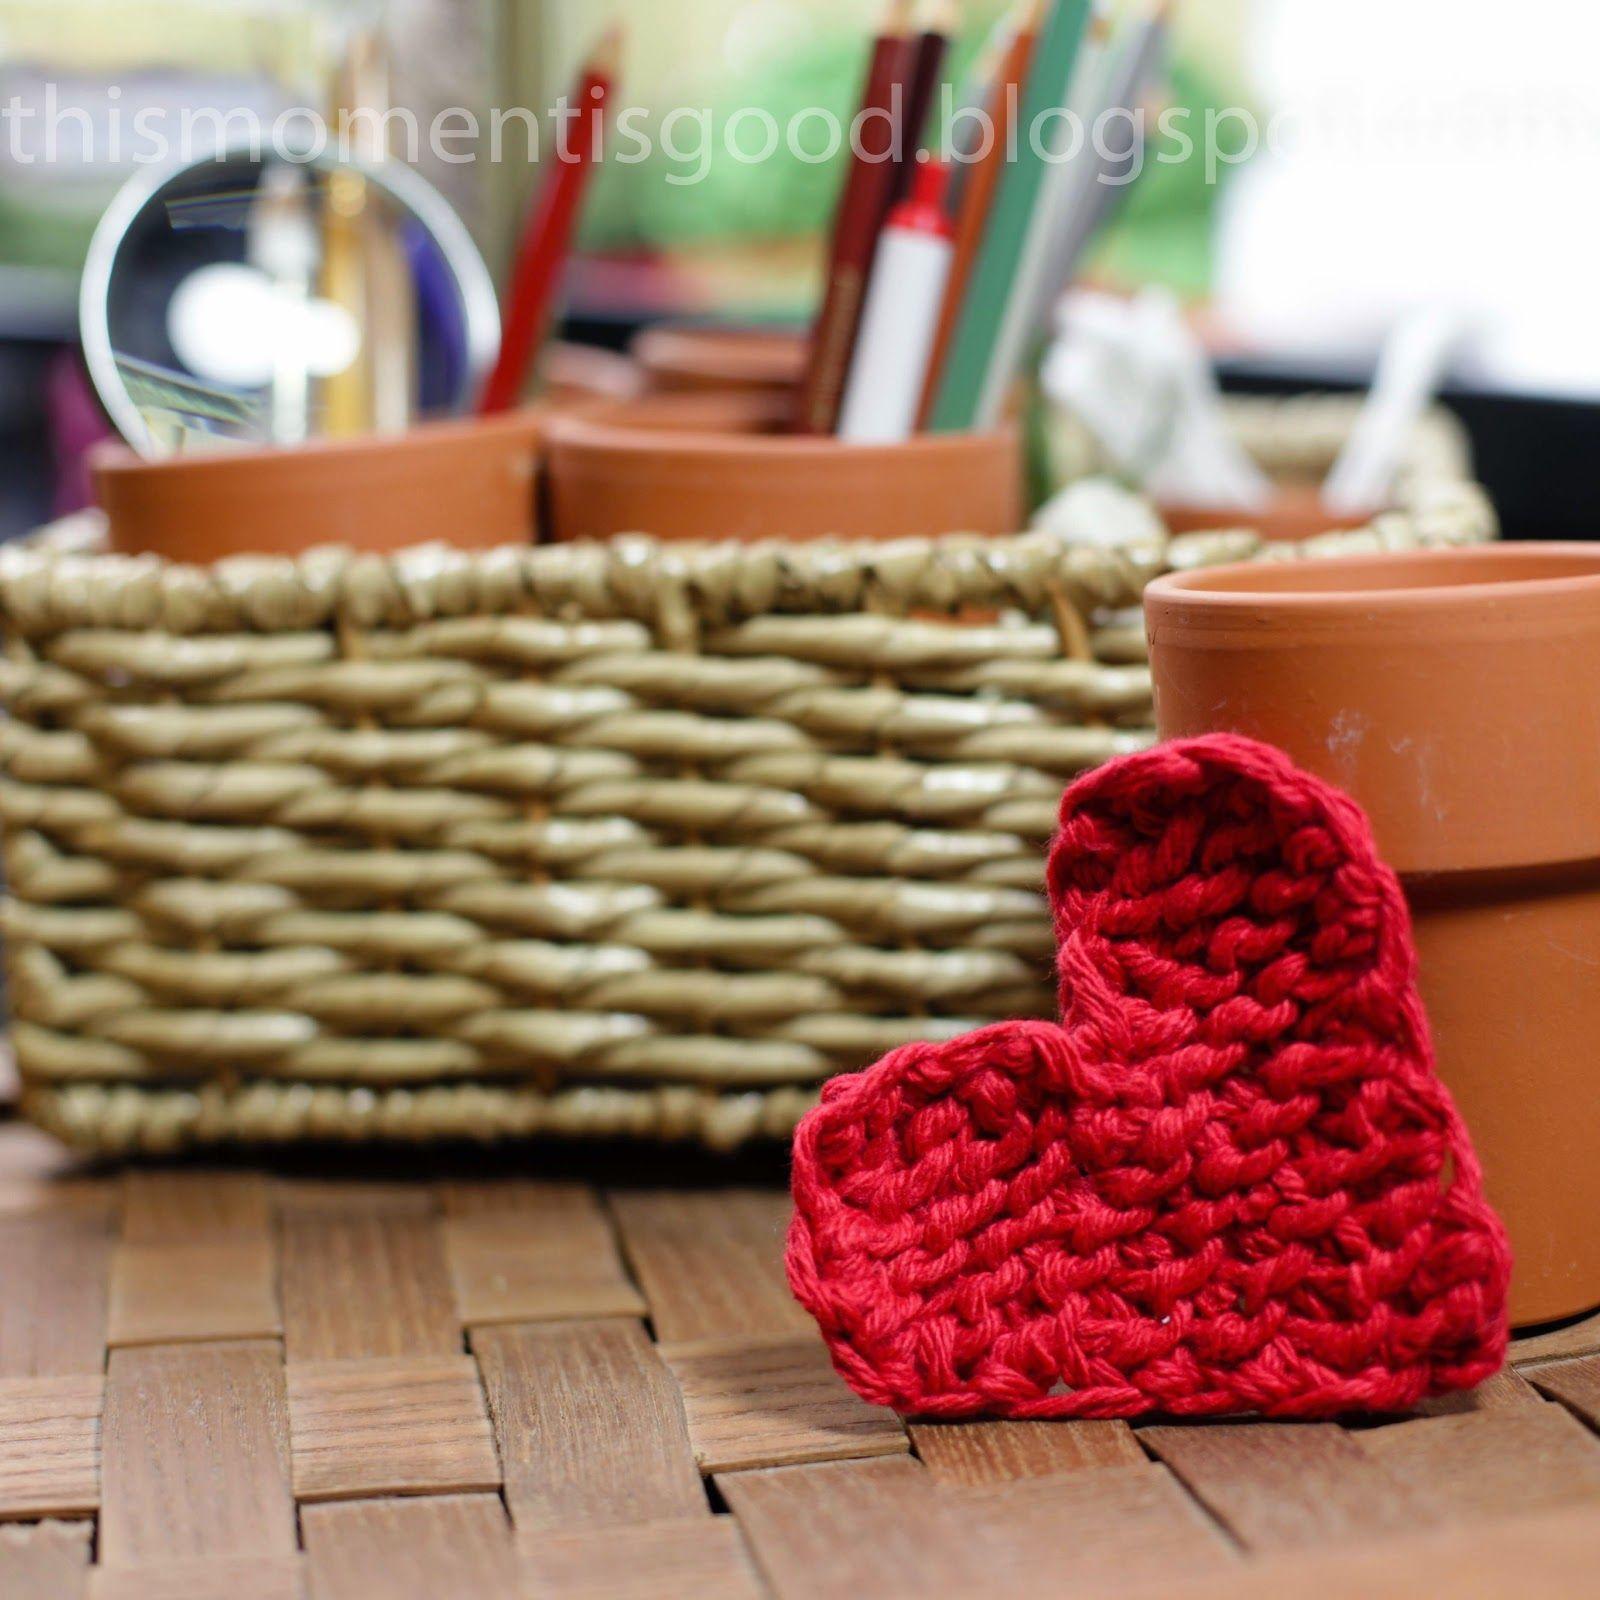 LOOM KNIT HEART - FREE PATTERN | Free pattern, Loom knitting and ...